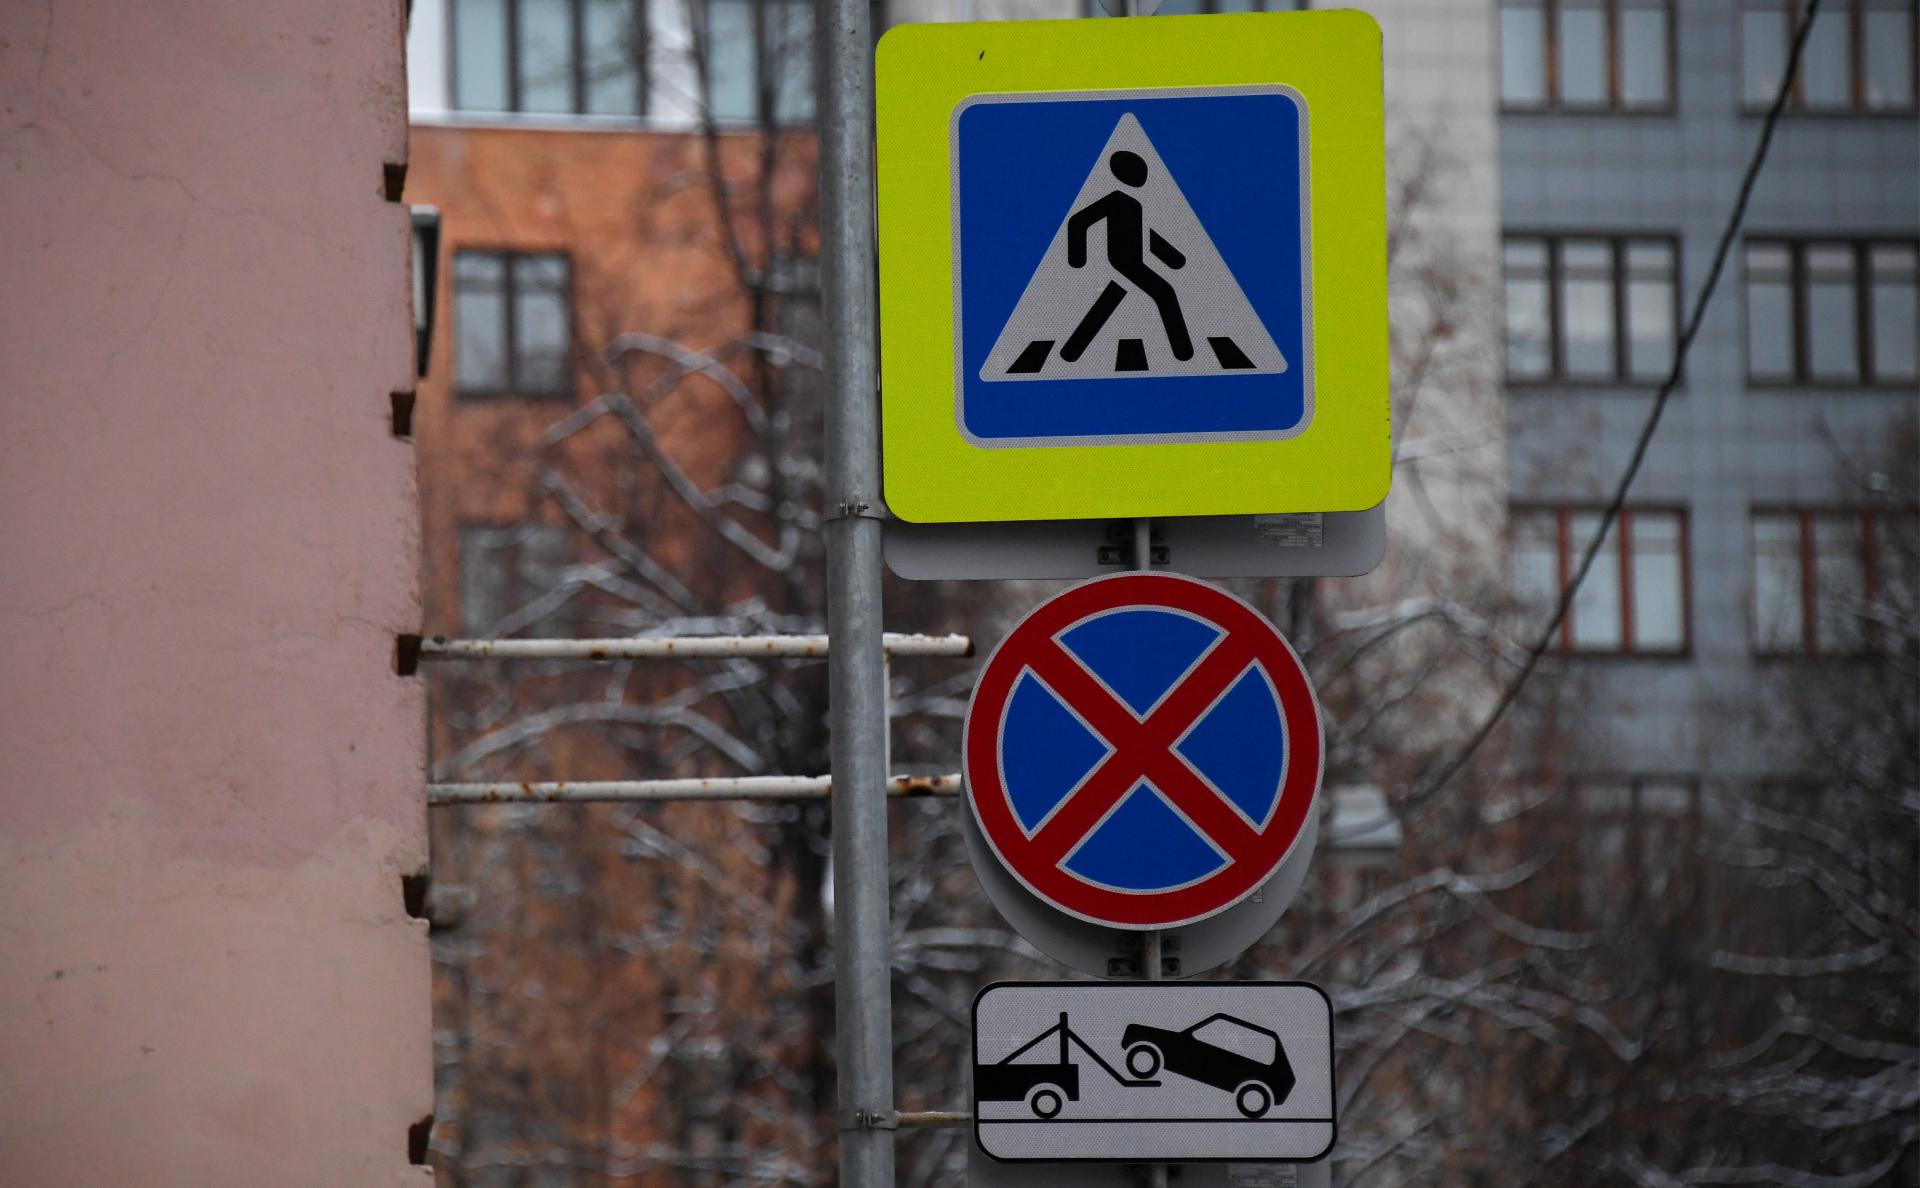 Фото: Нина Зотина / РИА Новости